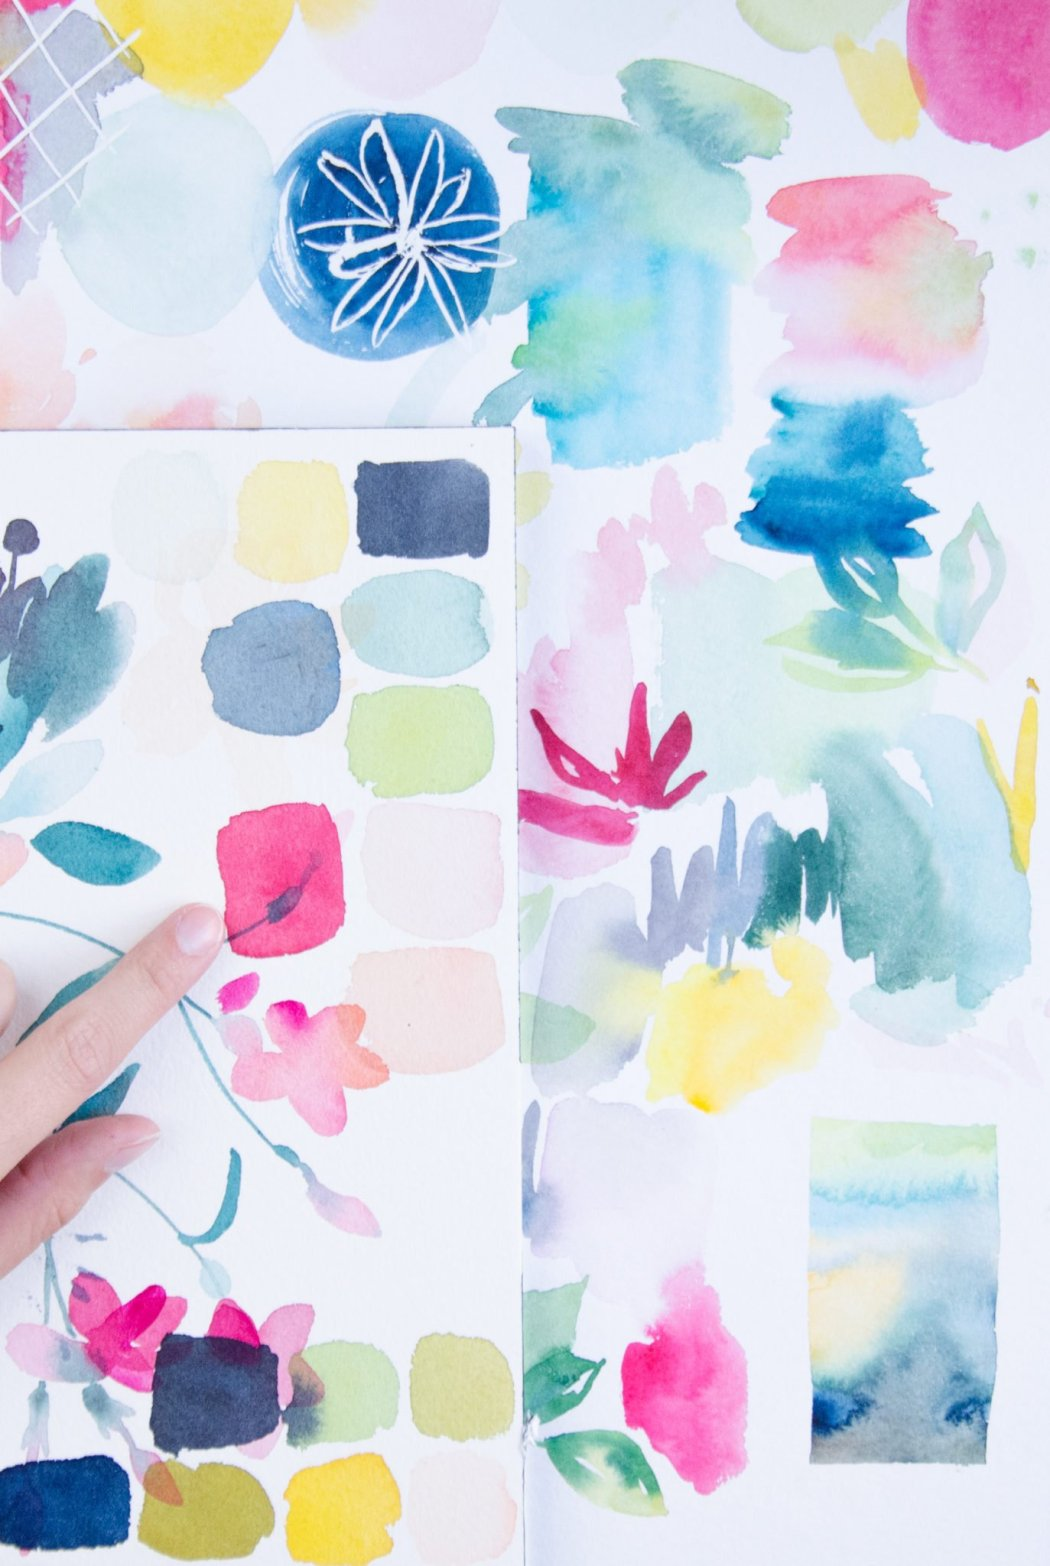 créer un nuancier facilement à l'aquarelle